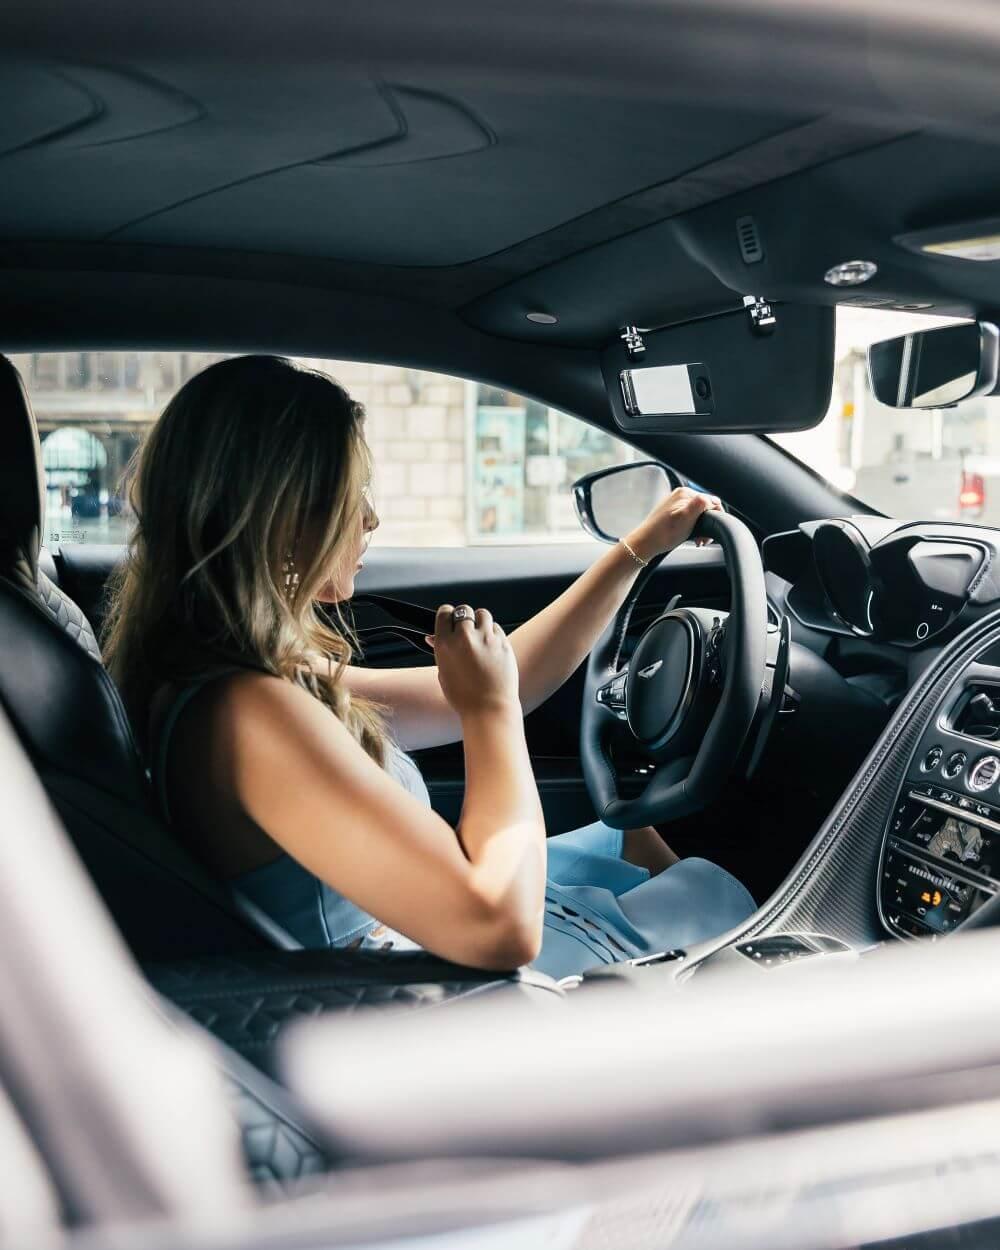 driving tips for beginner - be confident